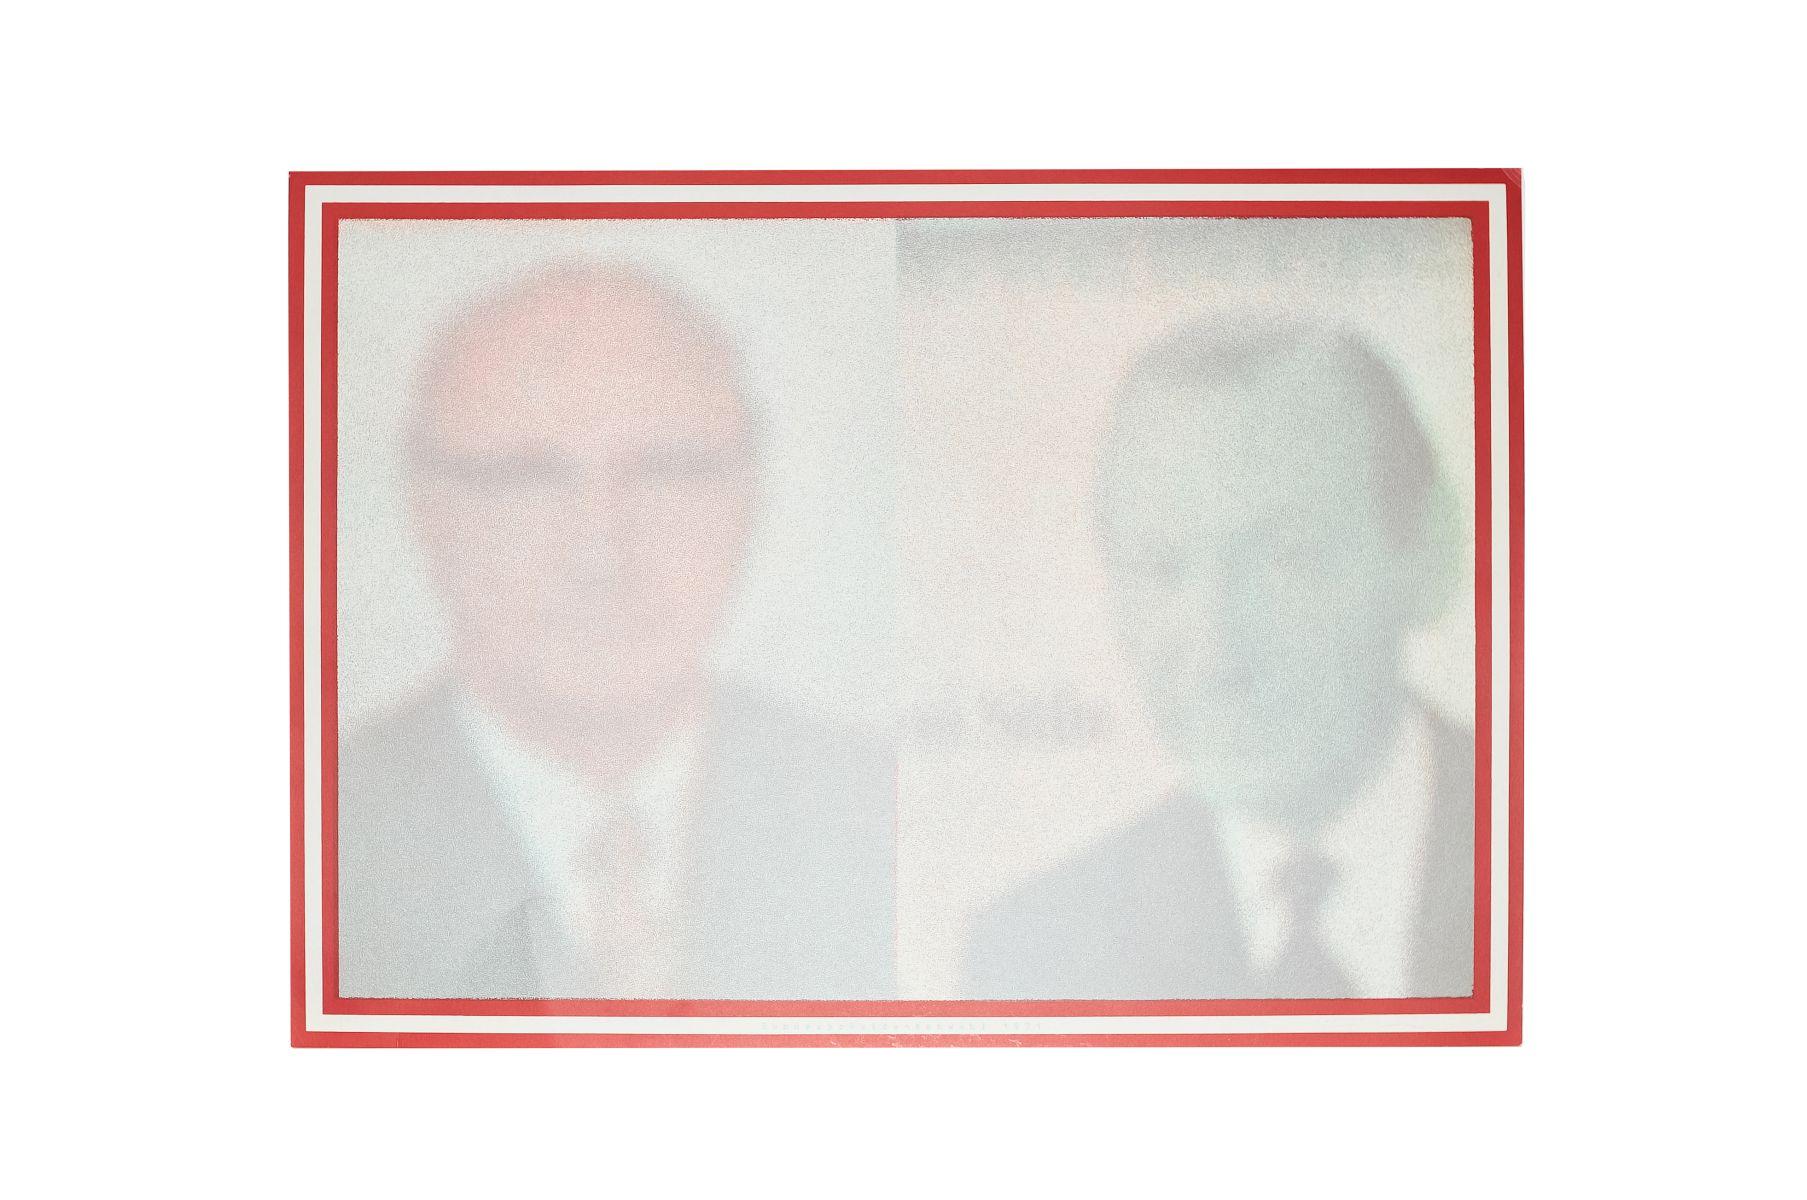 "#10 Erich Thorn( 1930-2012) ""Federal President"